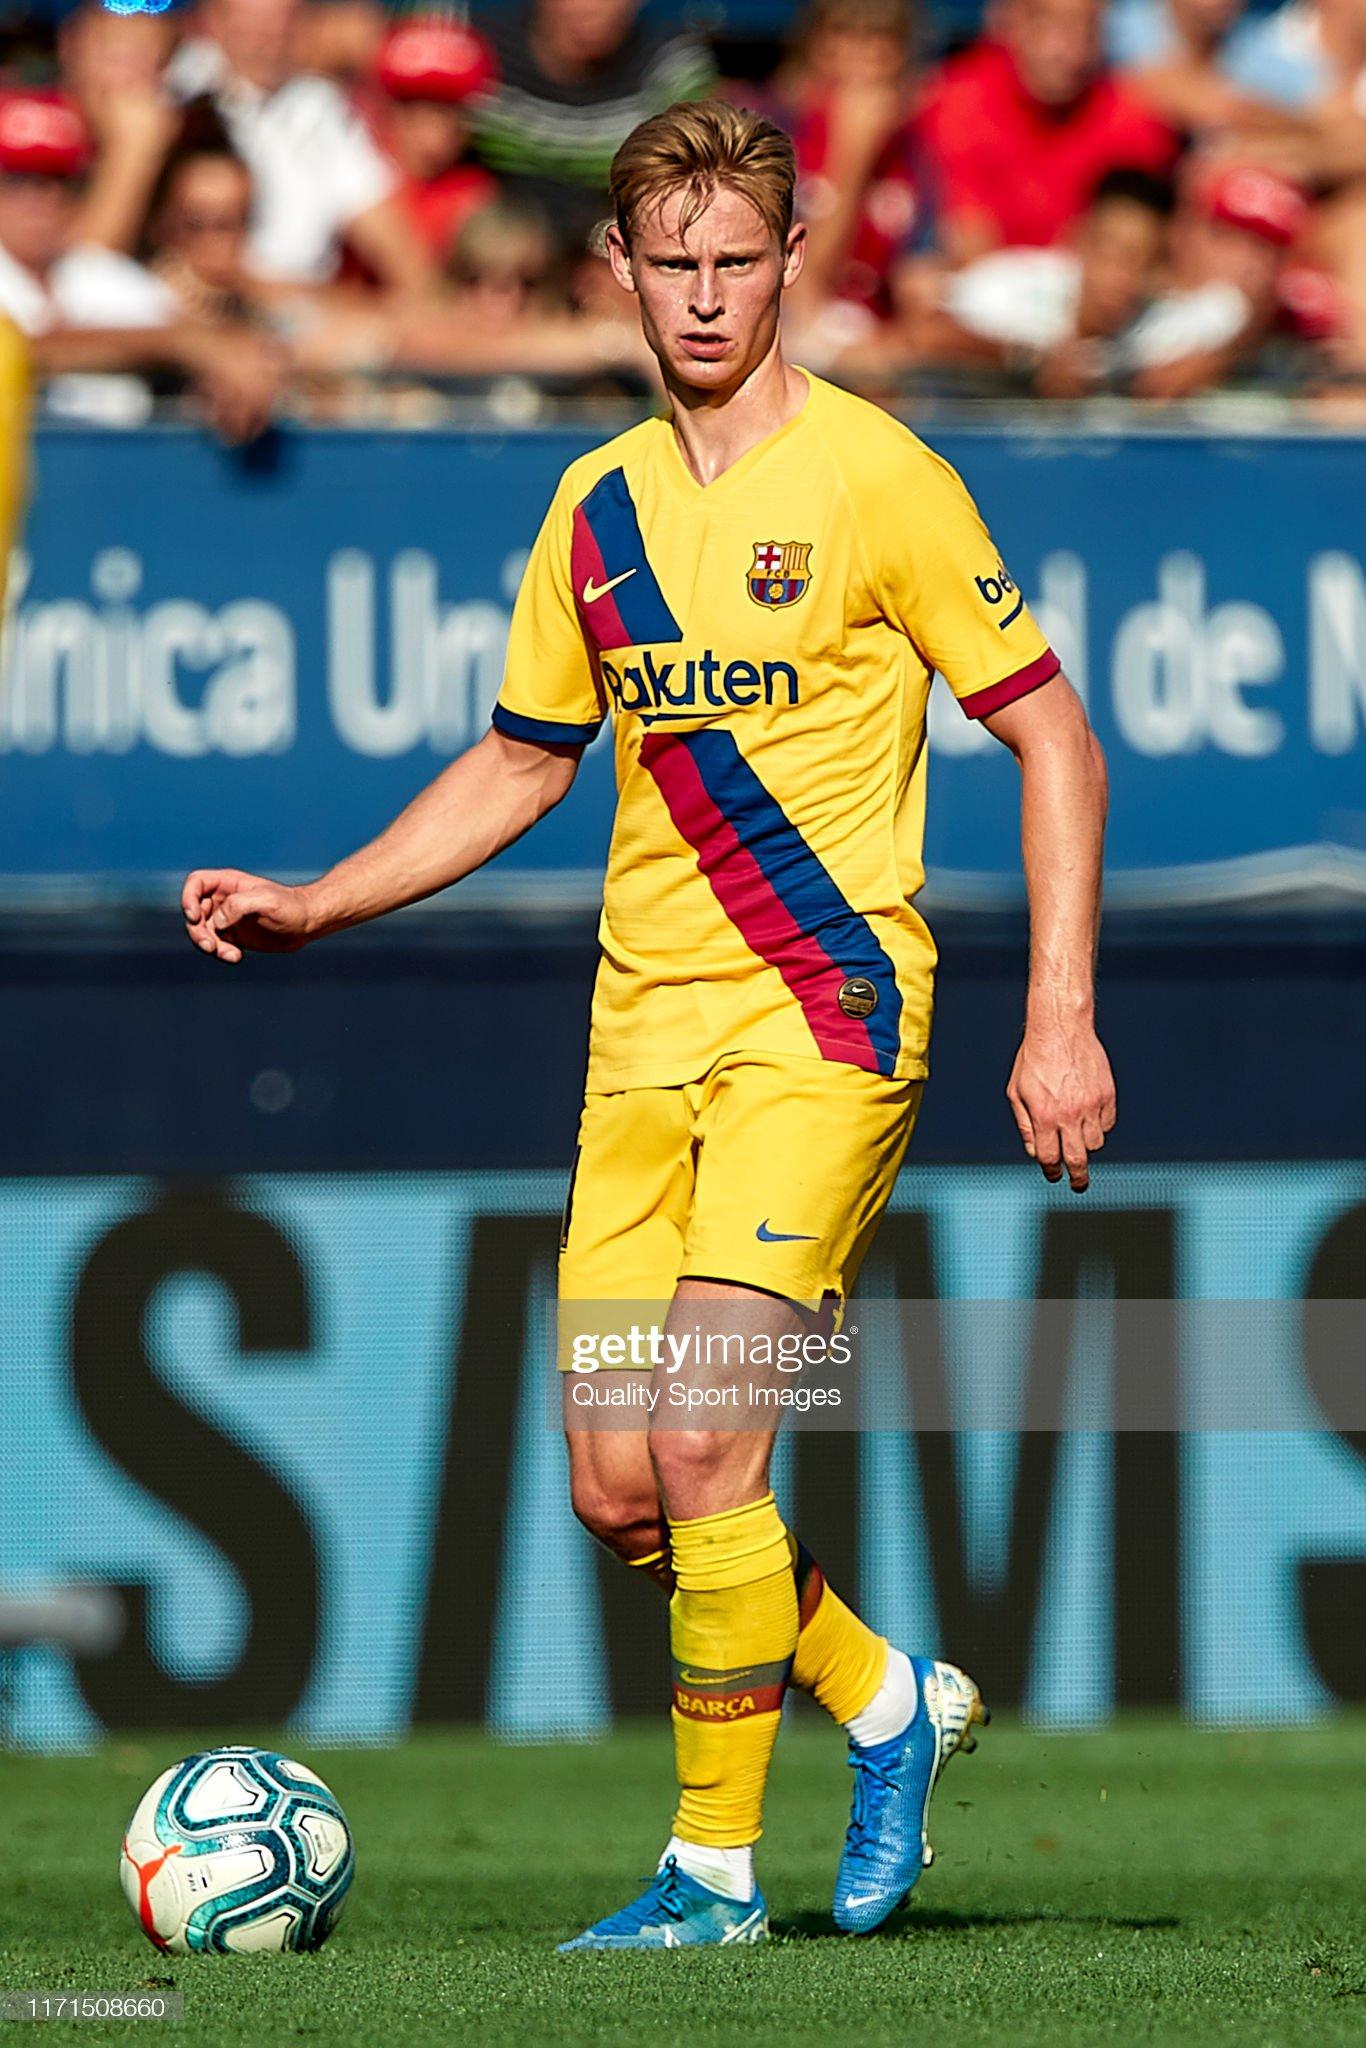 صور مباراة : أوساسونا - برشلونة 2-2 ( 31-08-2019 )  Frenkie-de-jong-of-fc-barcelona-with-the-ball-during-the-liga-match-picture-id1171508660?s=2048x2048